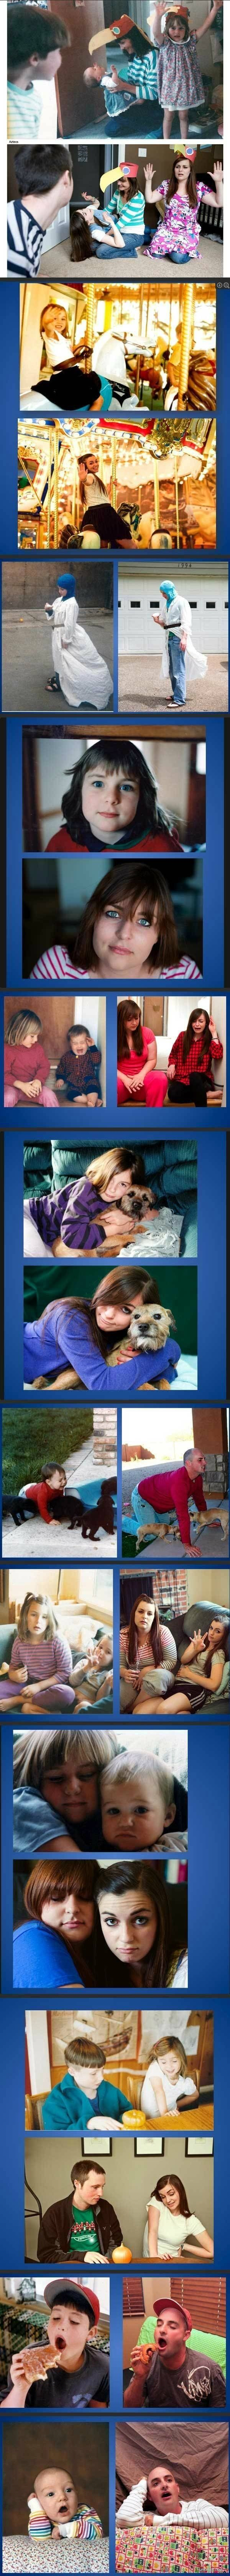 Recreated old family photos! Lol @Ashley Baker   we should totally do this hahaha